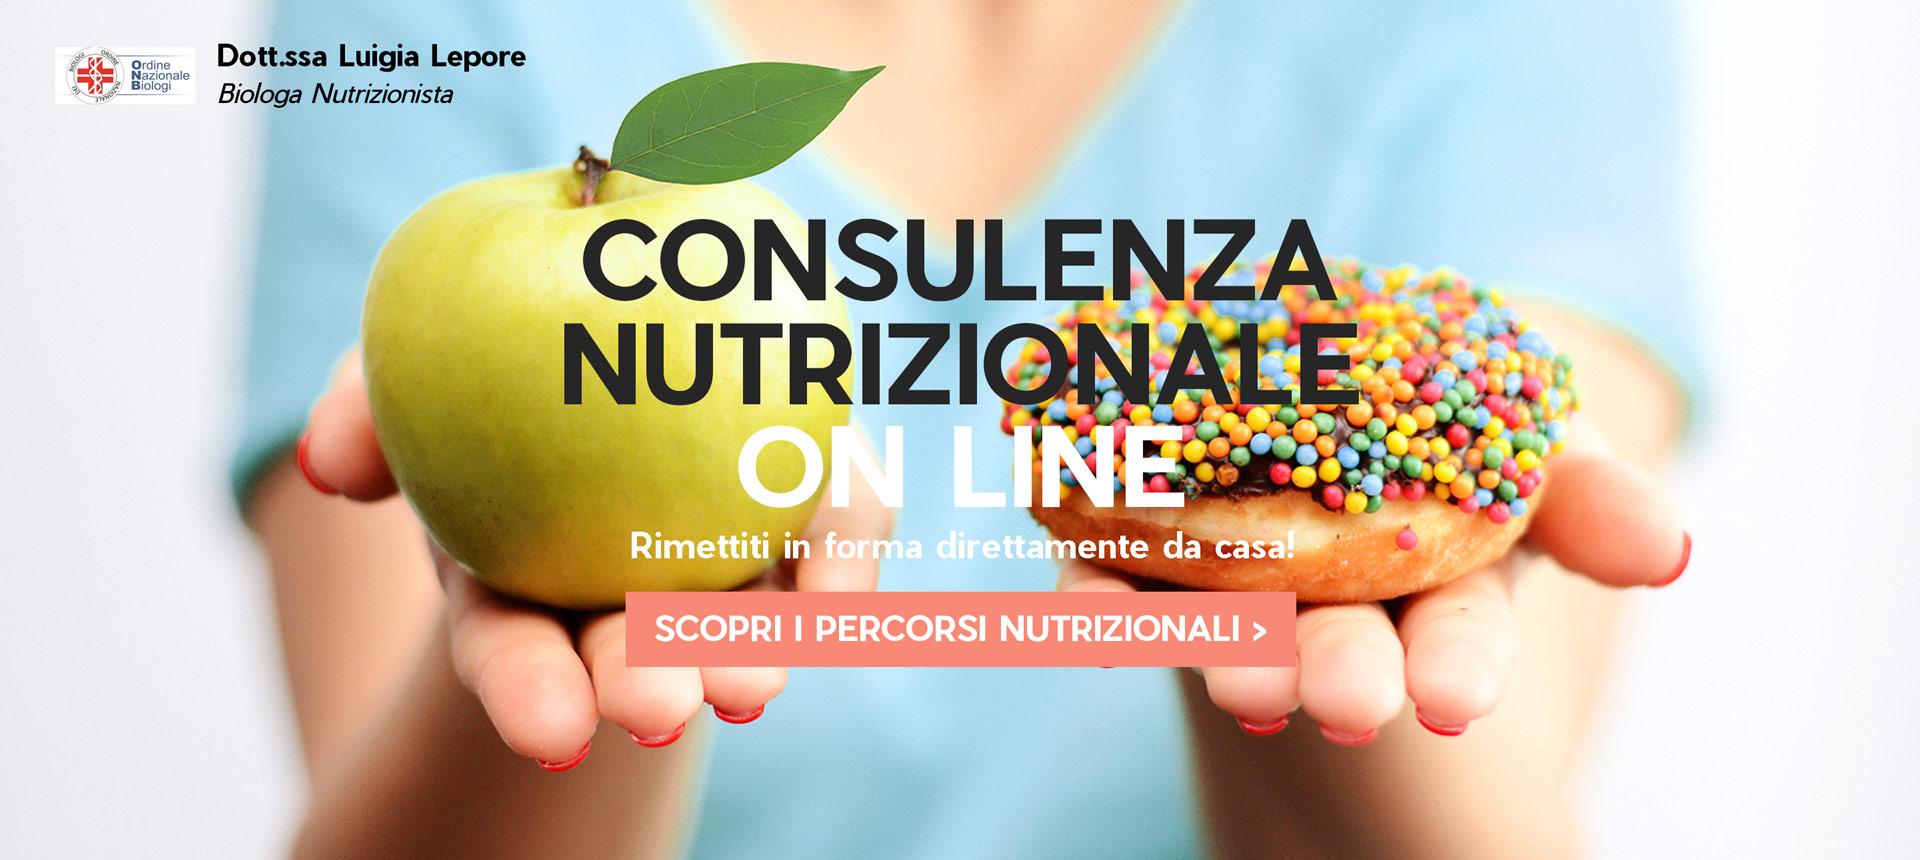 Consulenza-Nutrizionale-On-Line-Sanaline